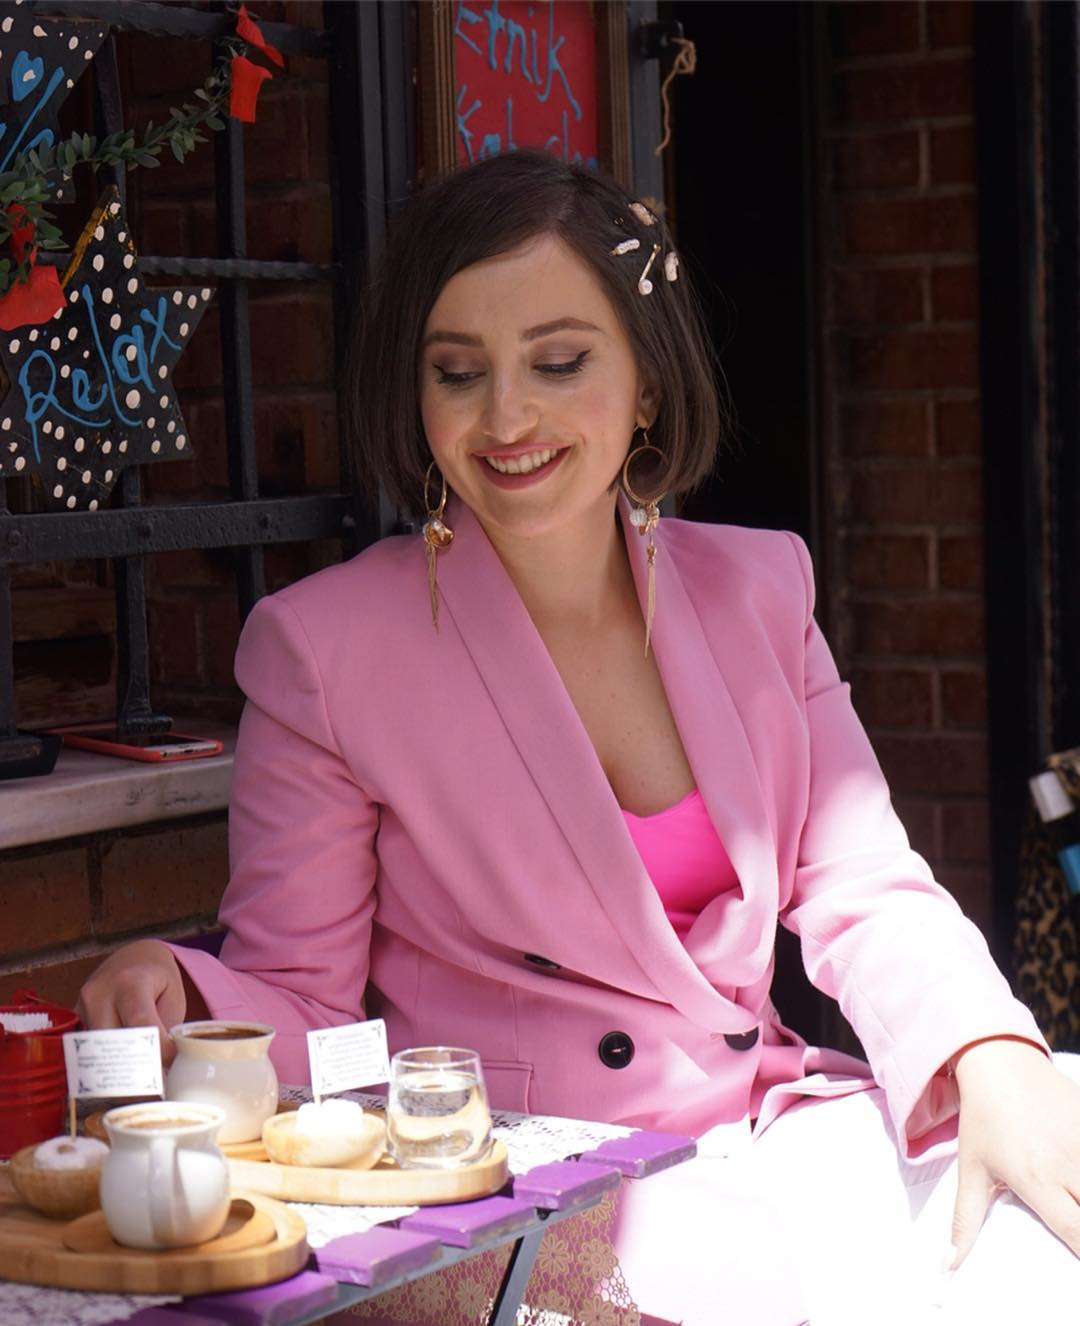 veste à boutonnage croisé de Zara sur thetravelstylesleep